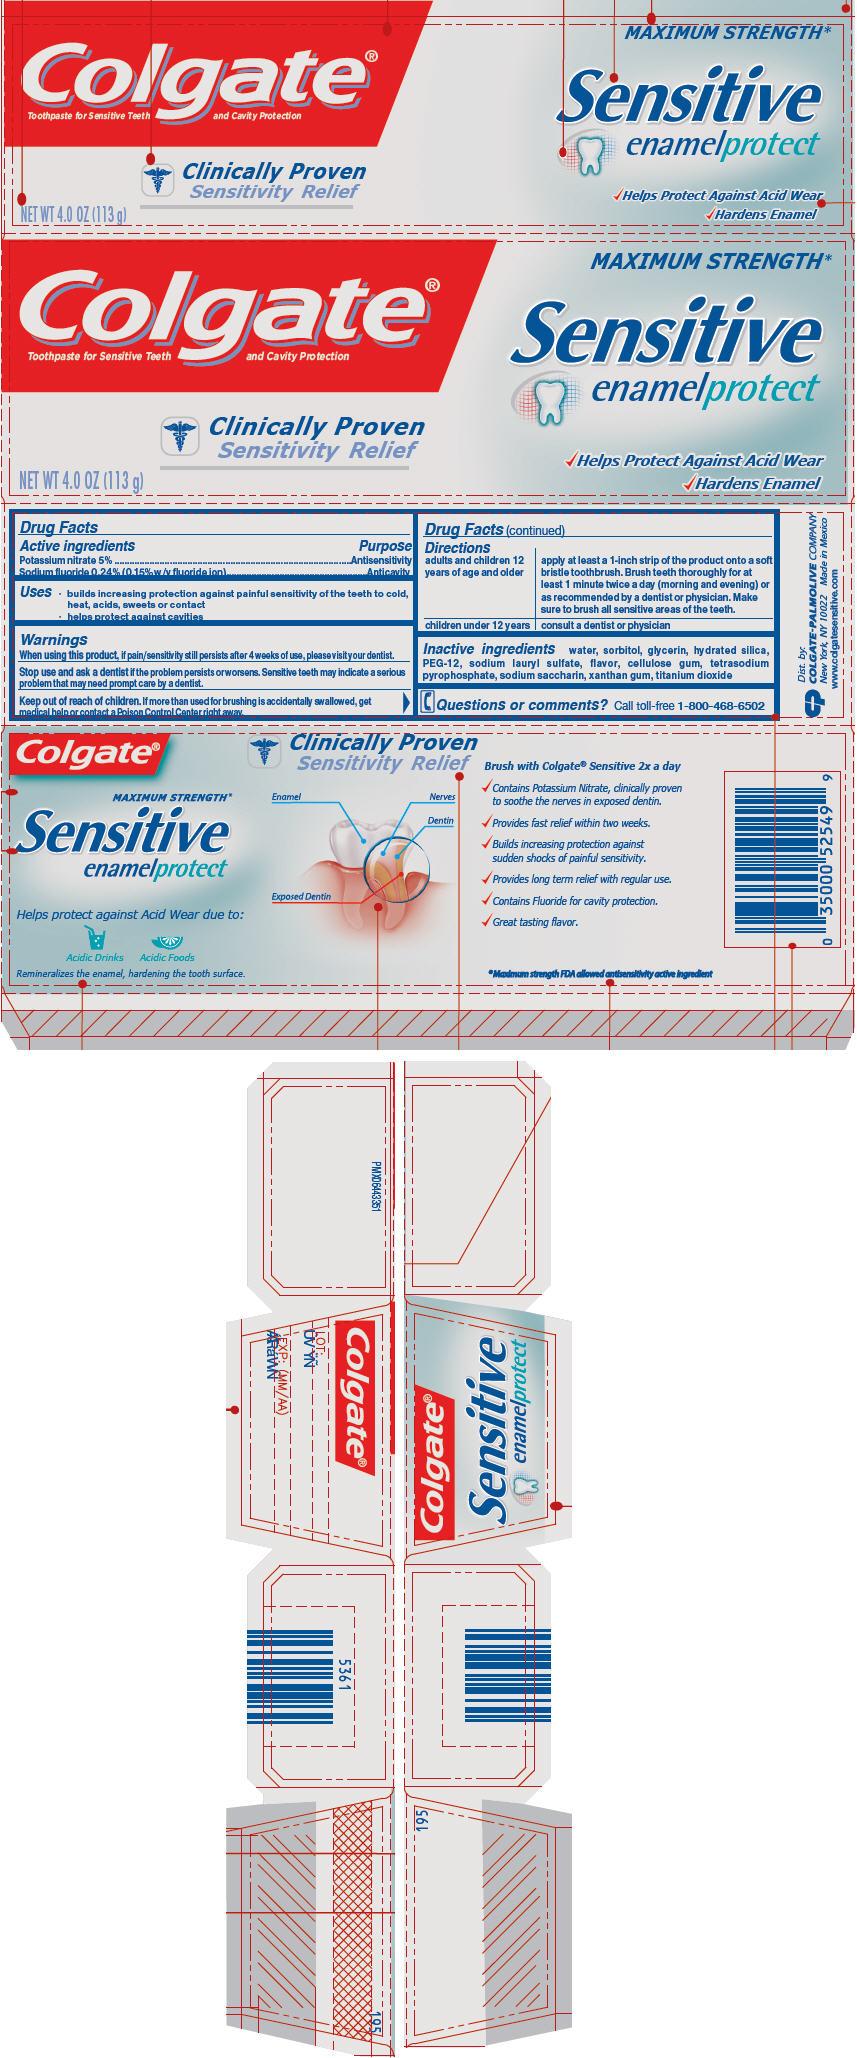 Colgate Sensitive Enamel Protect (Sodium Fluoride And Potassium Nitrate) Paste, Dentifrice [Mission Hills S.a De C.v]